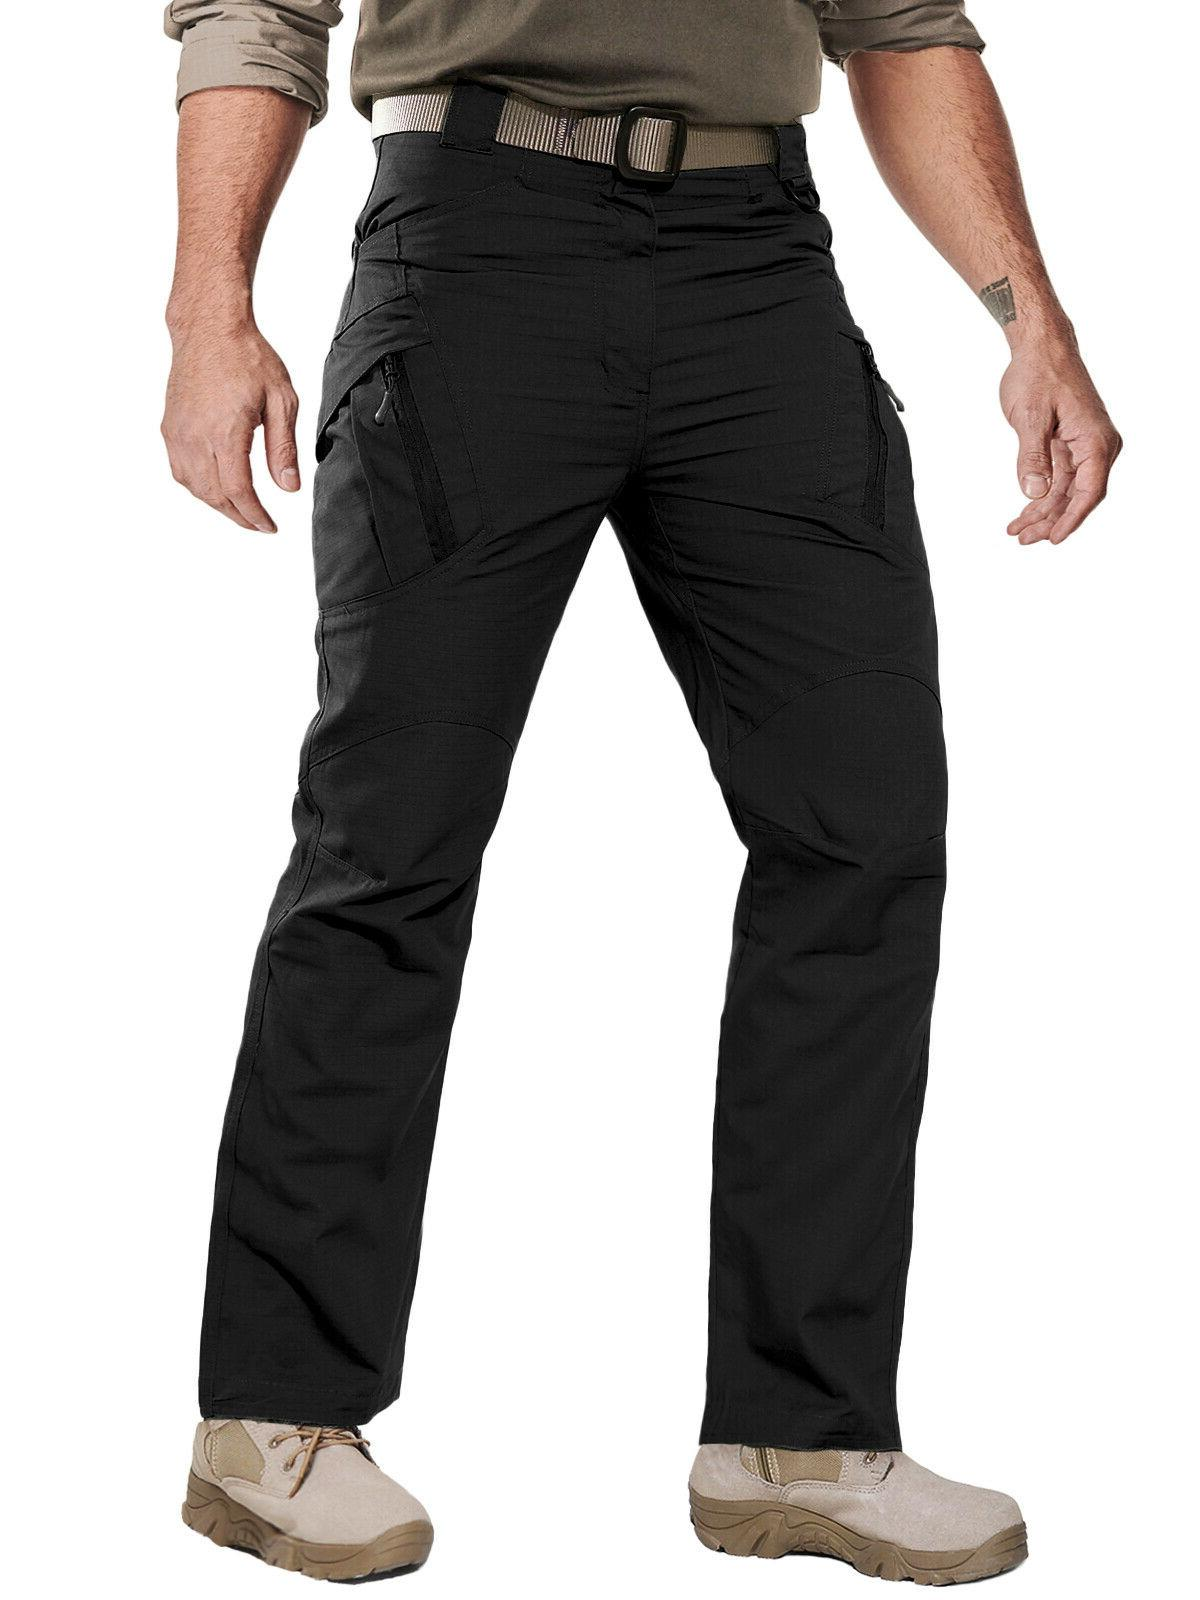 Zip Mens Tactical Cargo Rip-stop Pants UTP Trousers